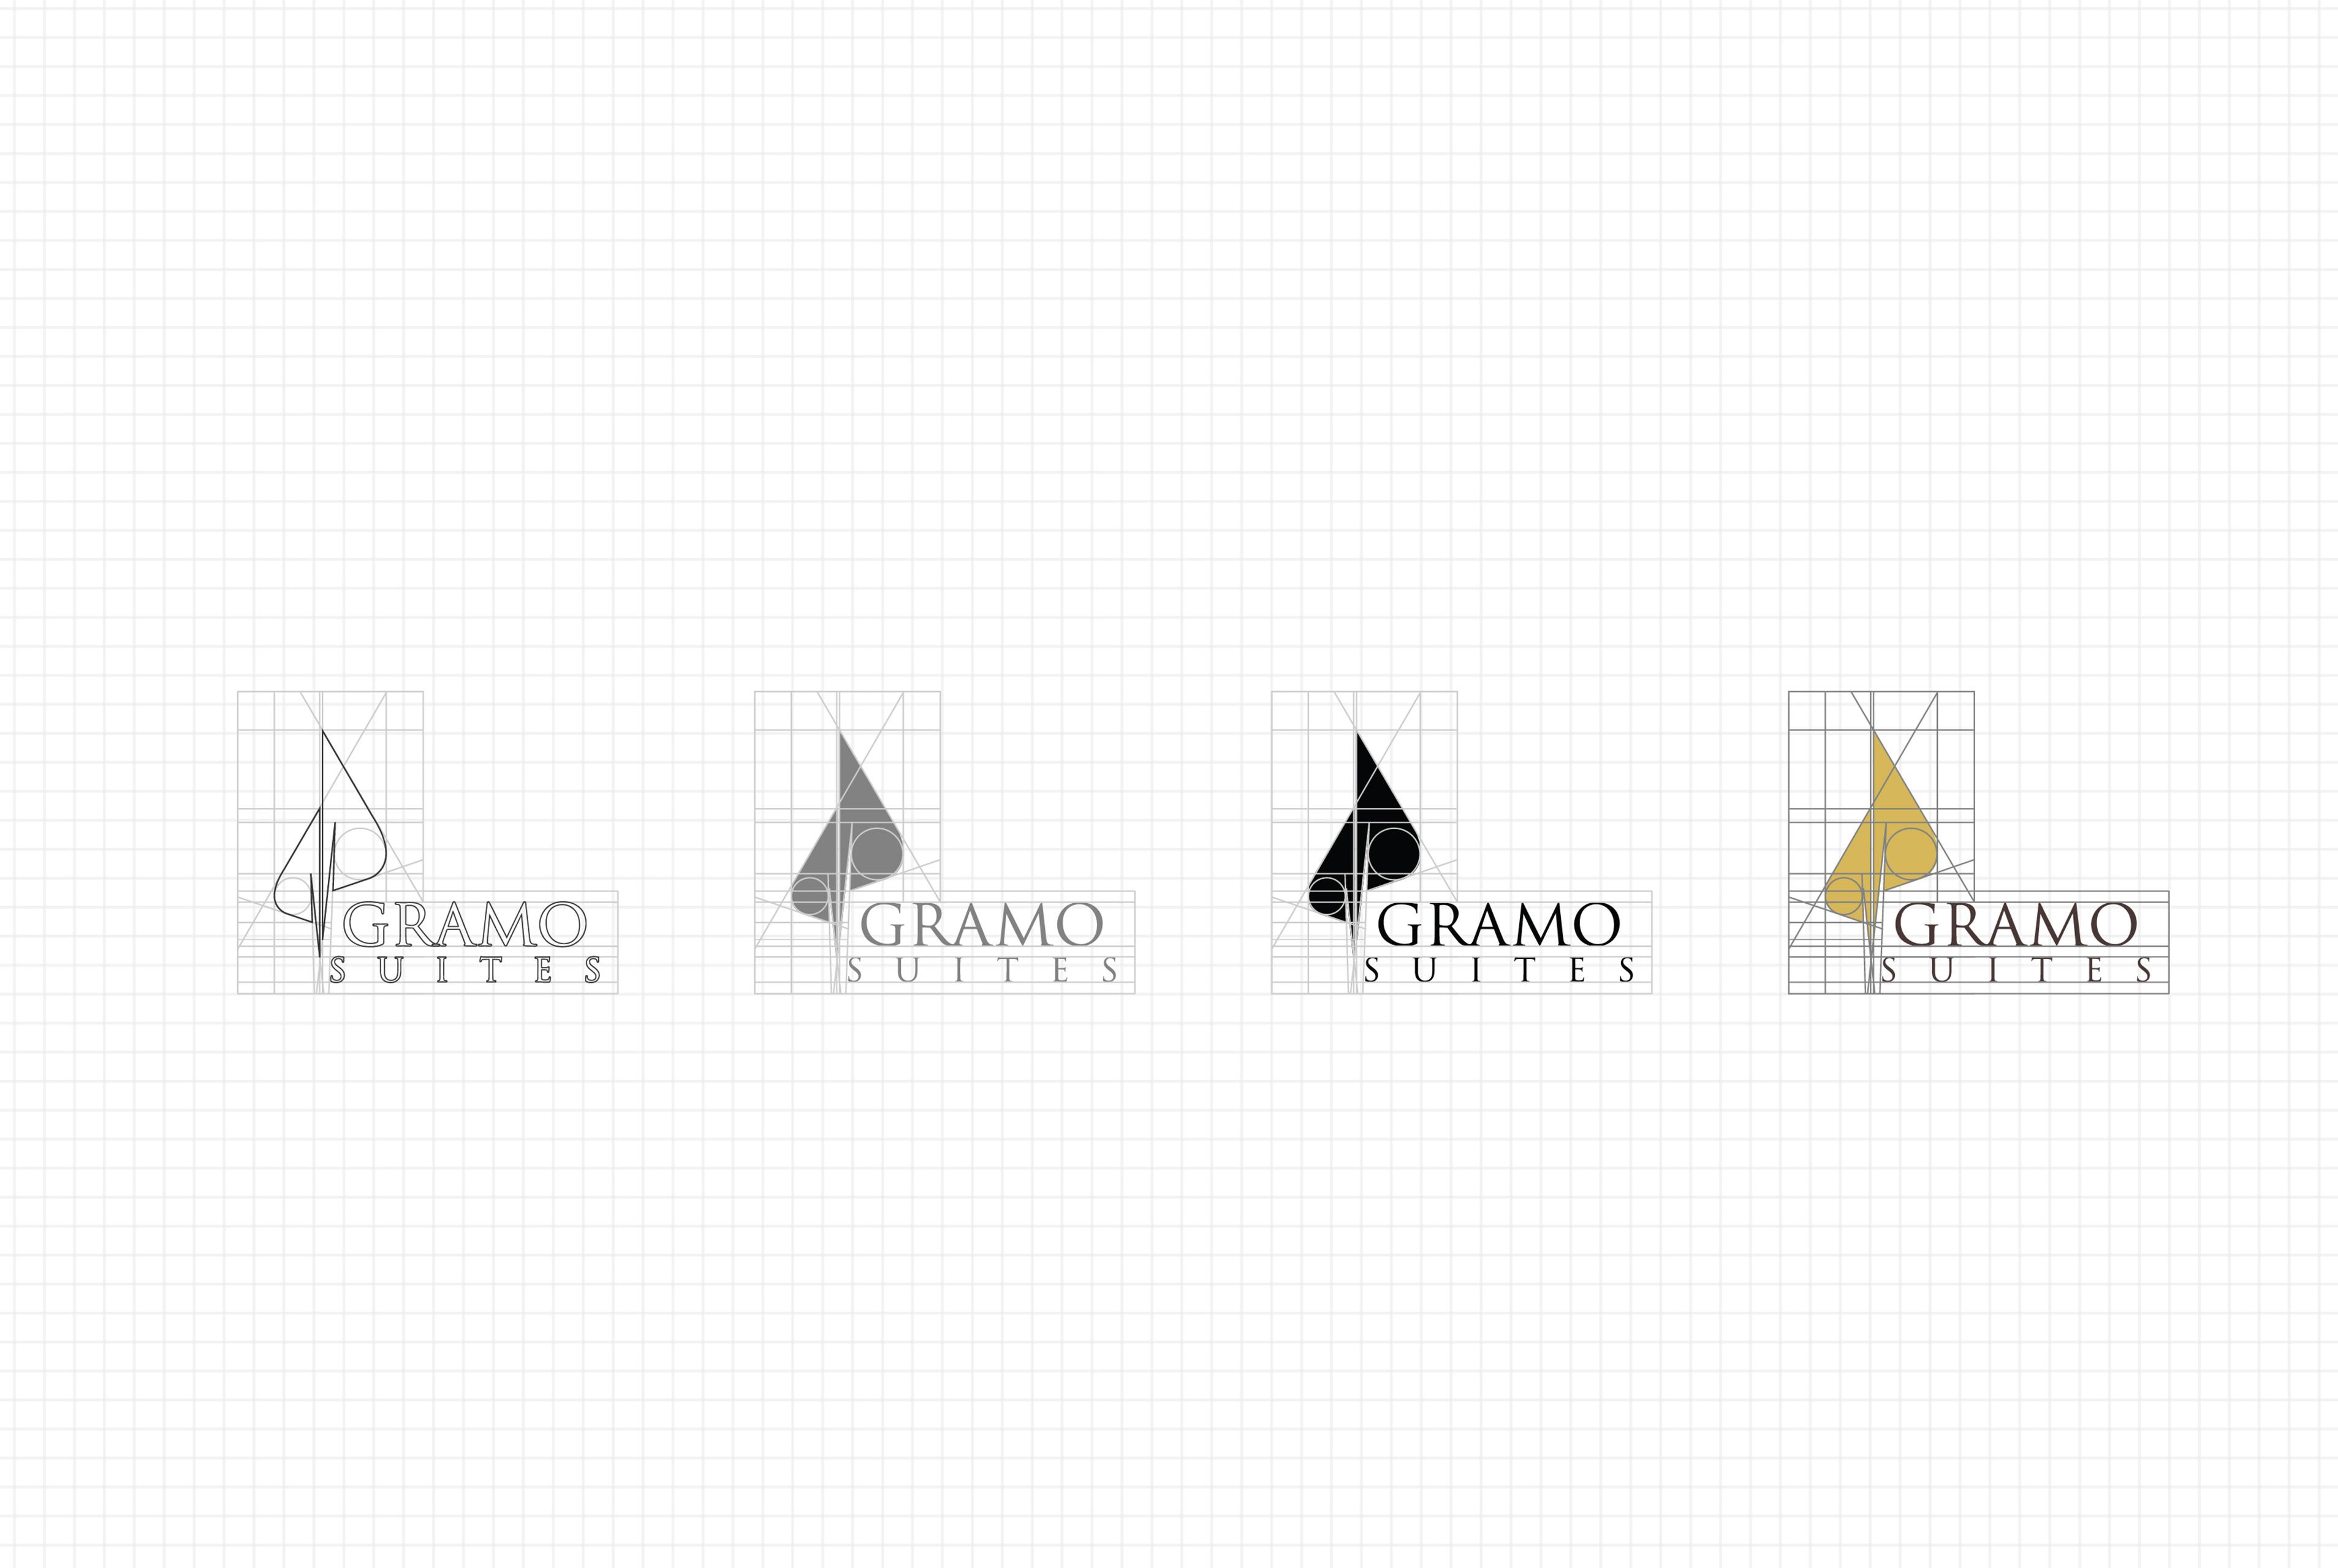 2_logo proression